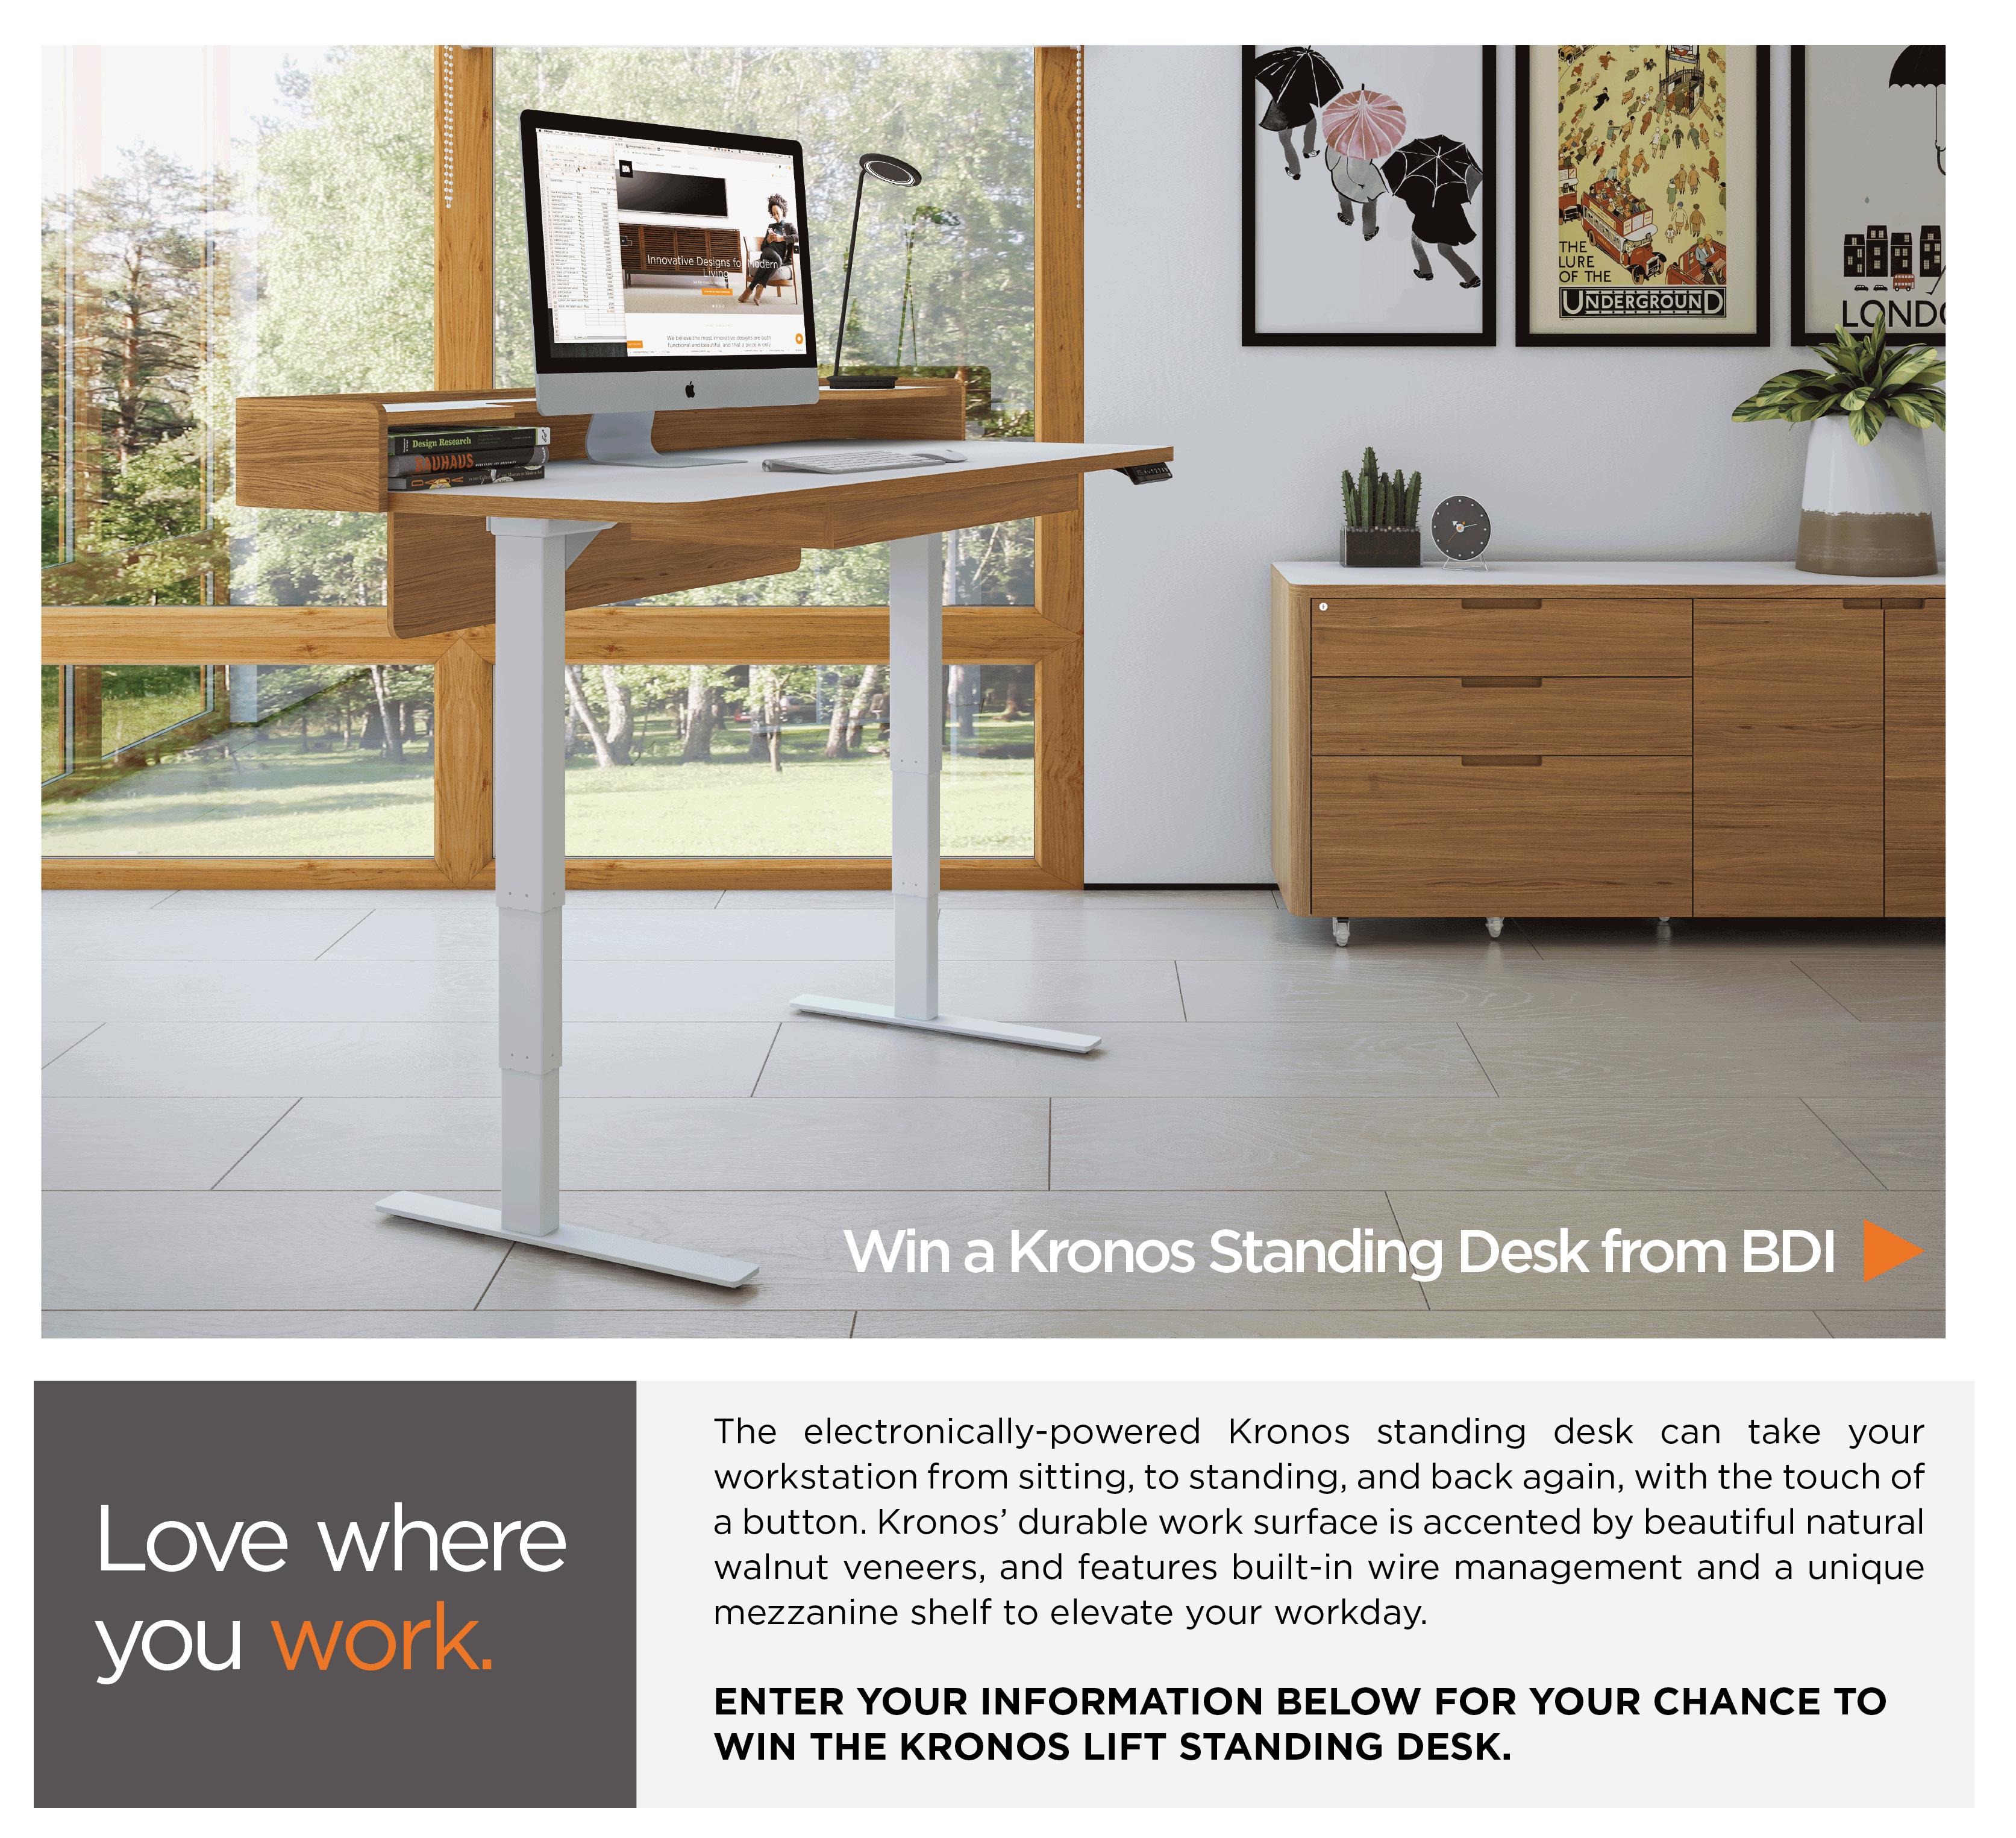 idea cupboard furniture today homes pedestal bdi mag duo lighting s desk board decor todays